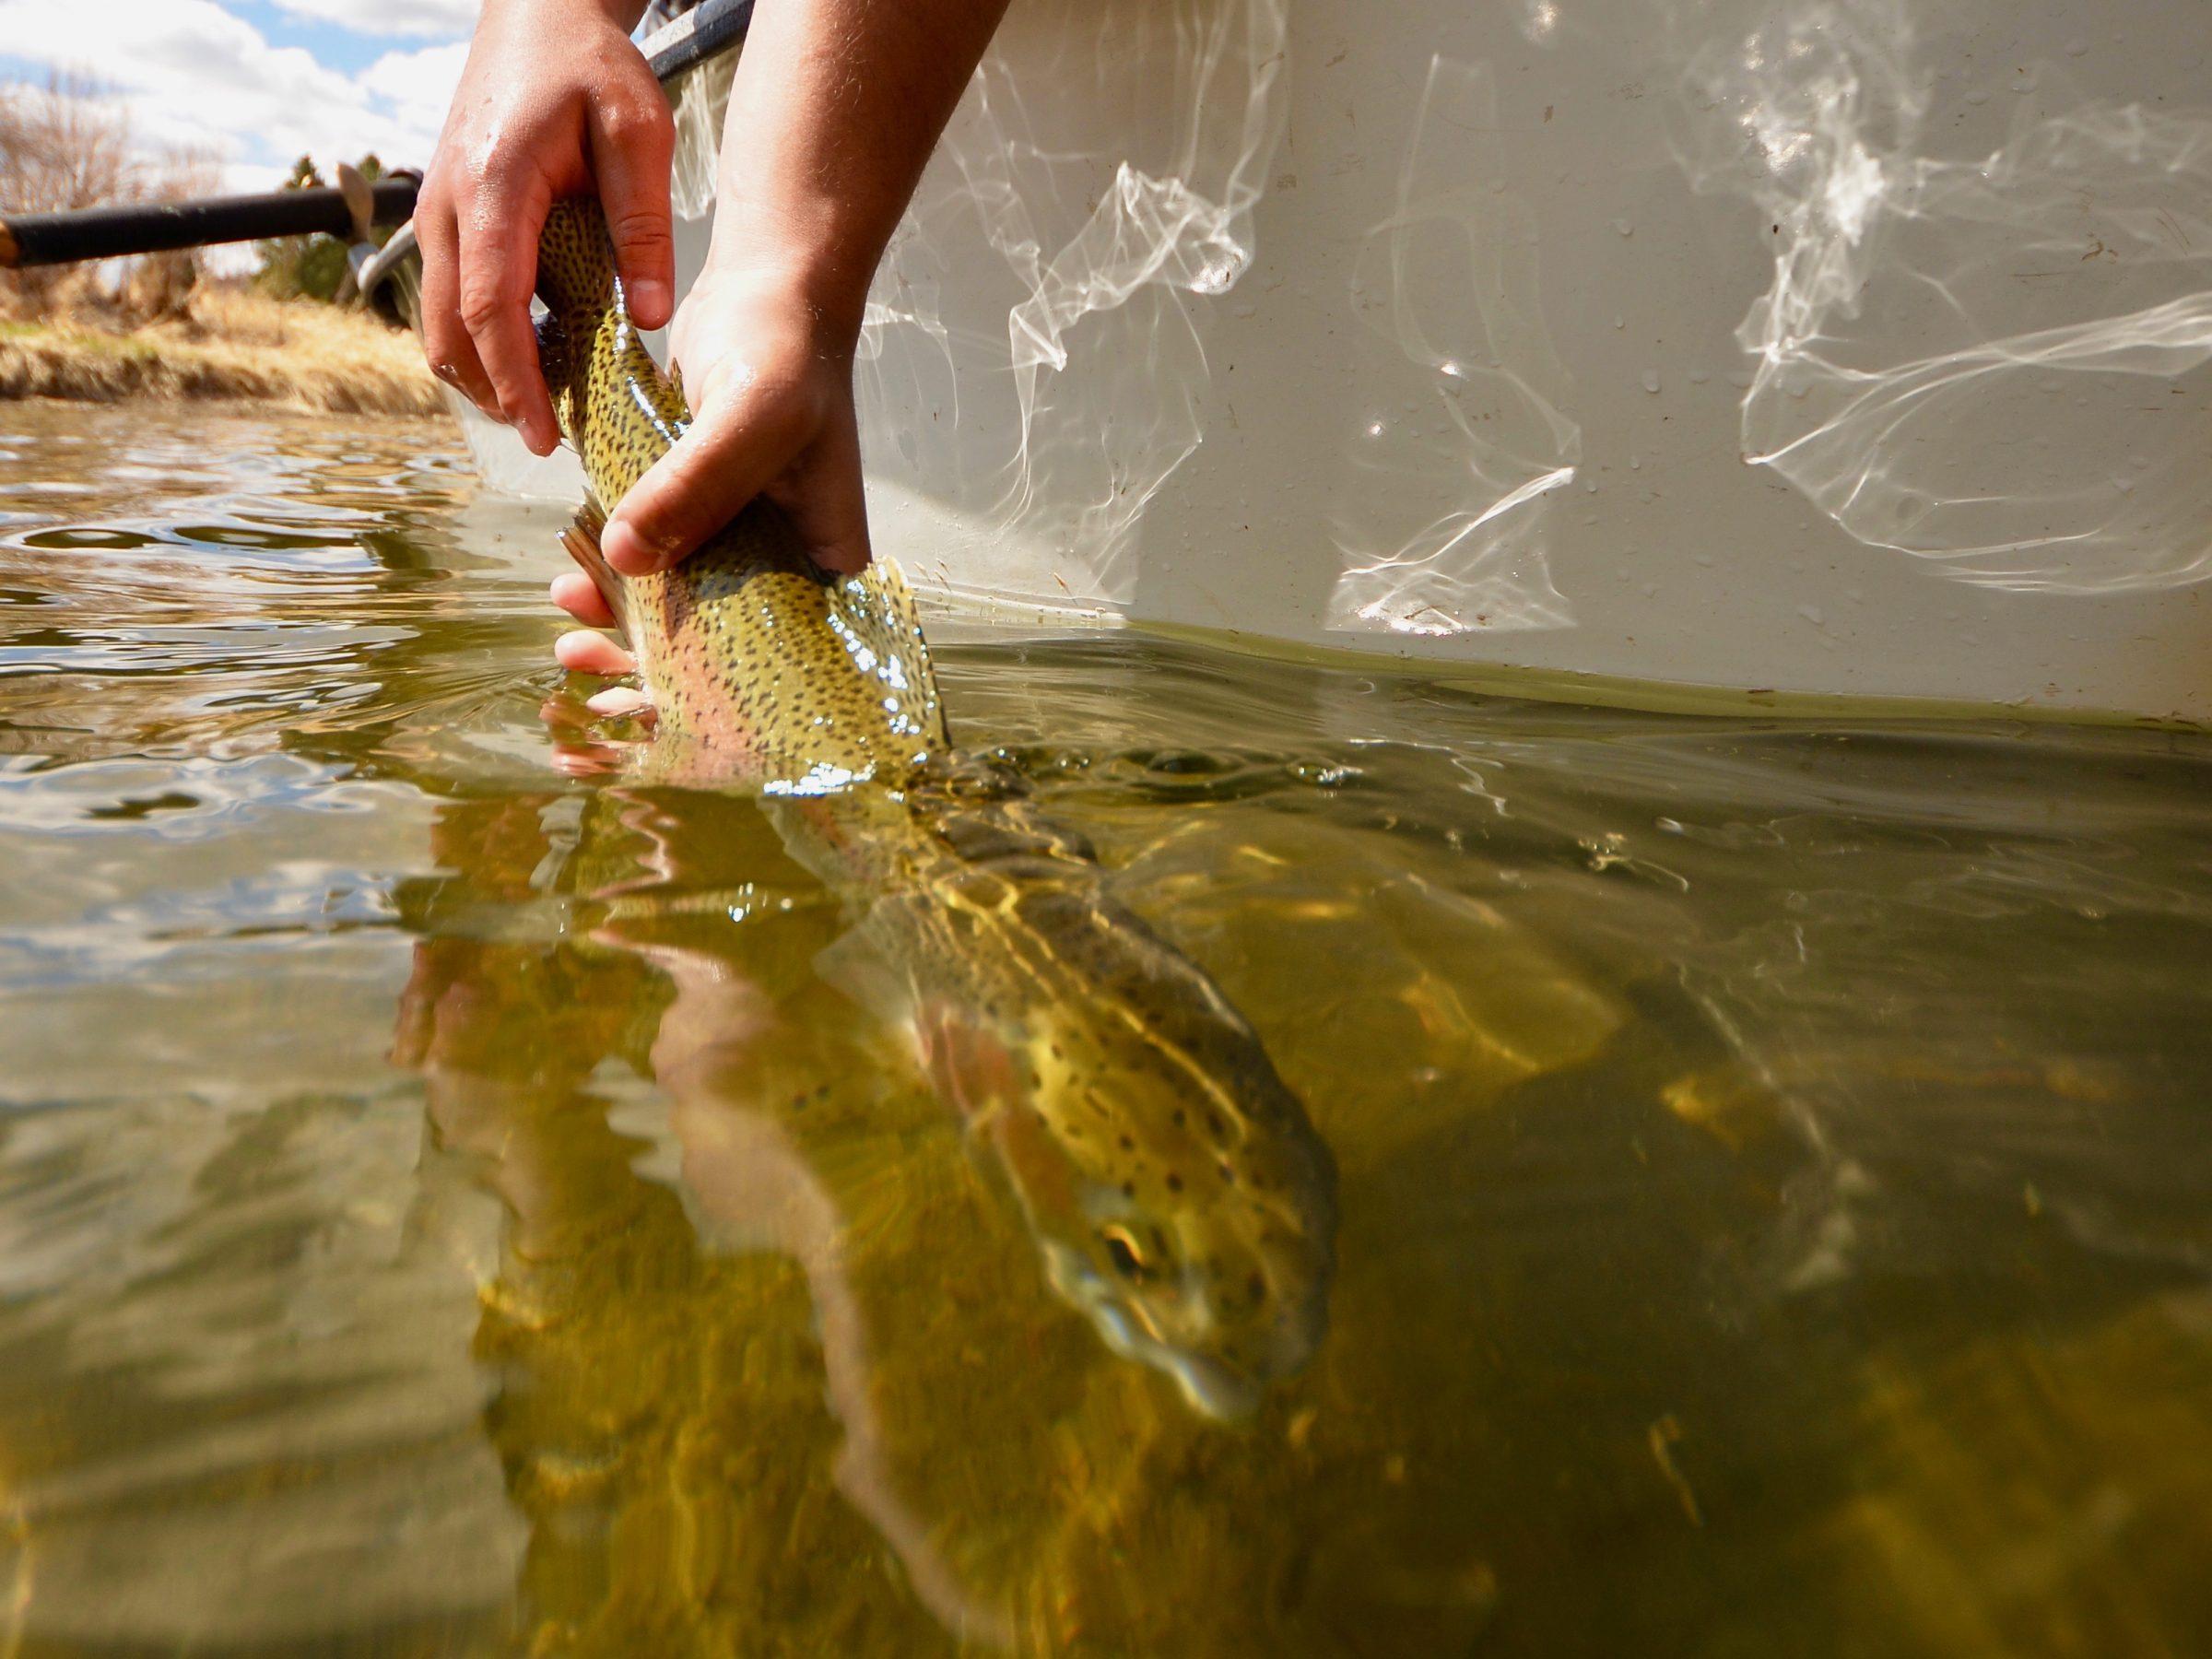 Missouri River Fishing Report 4.29.21